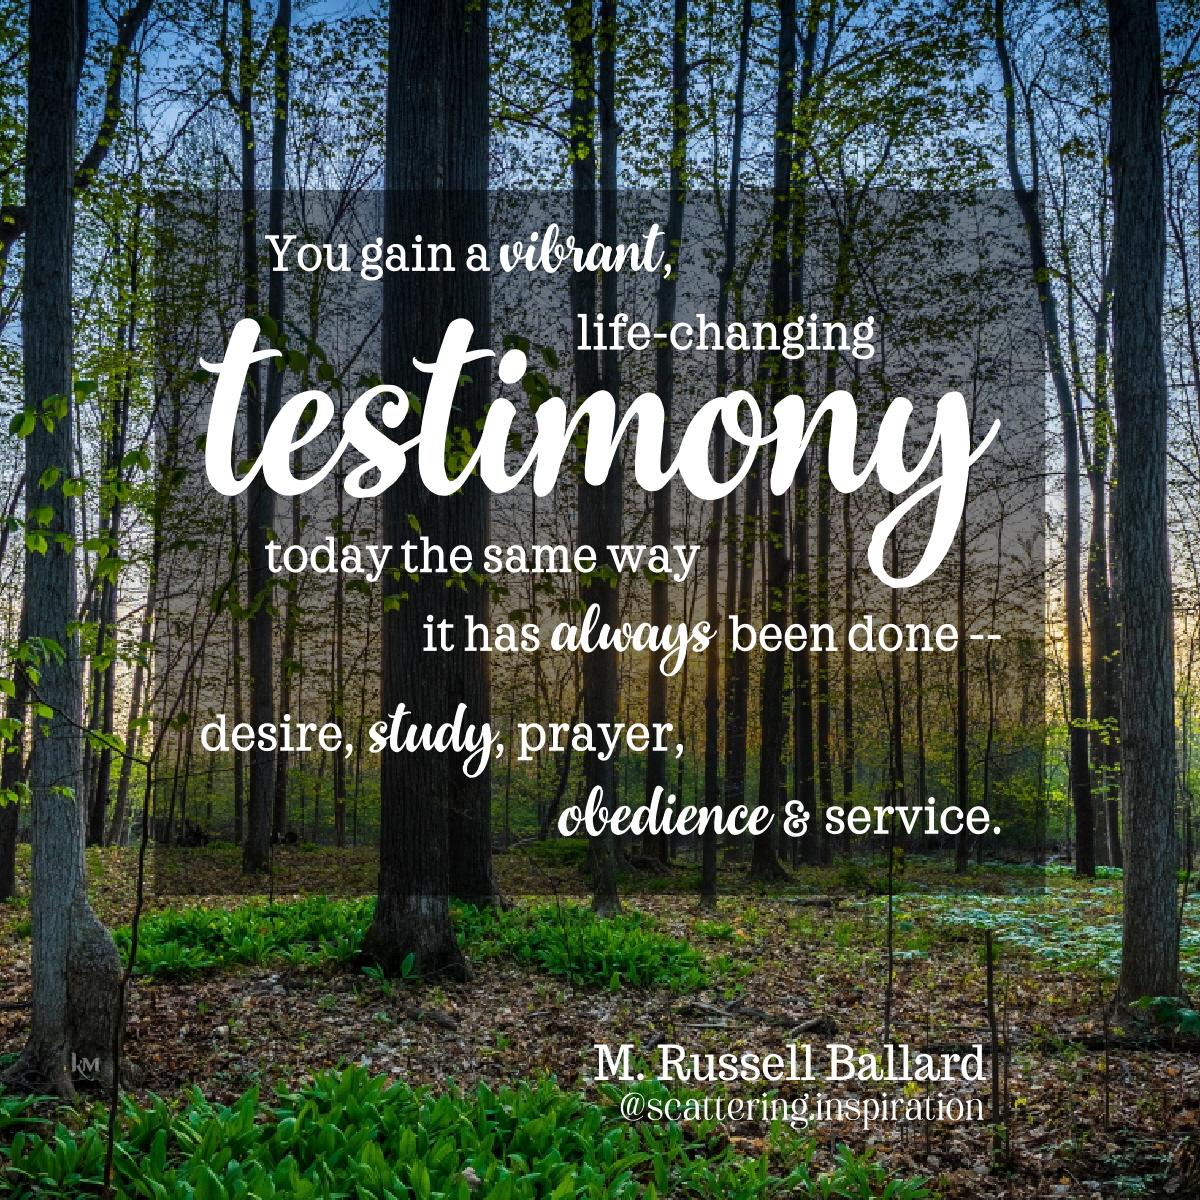 vibrant life-changing testimony